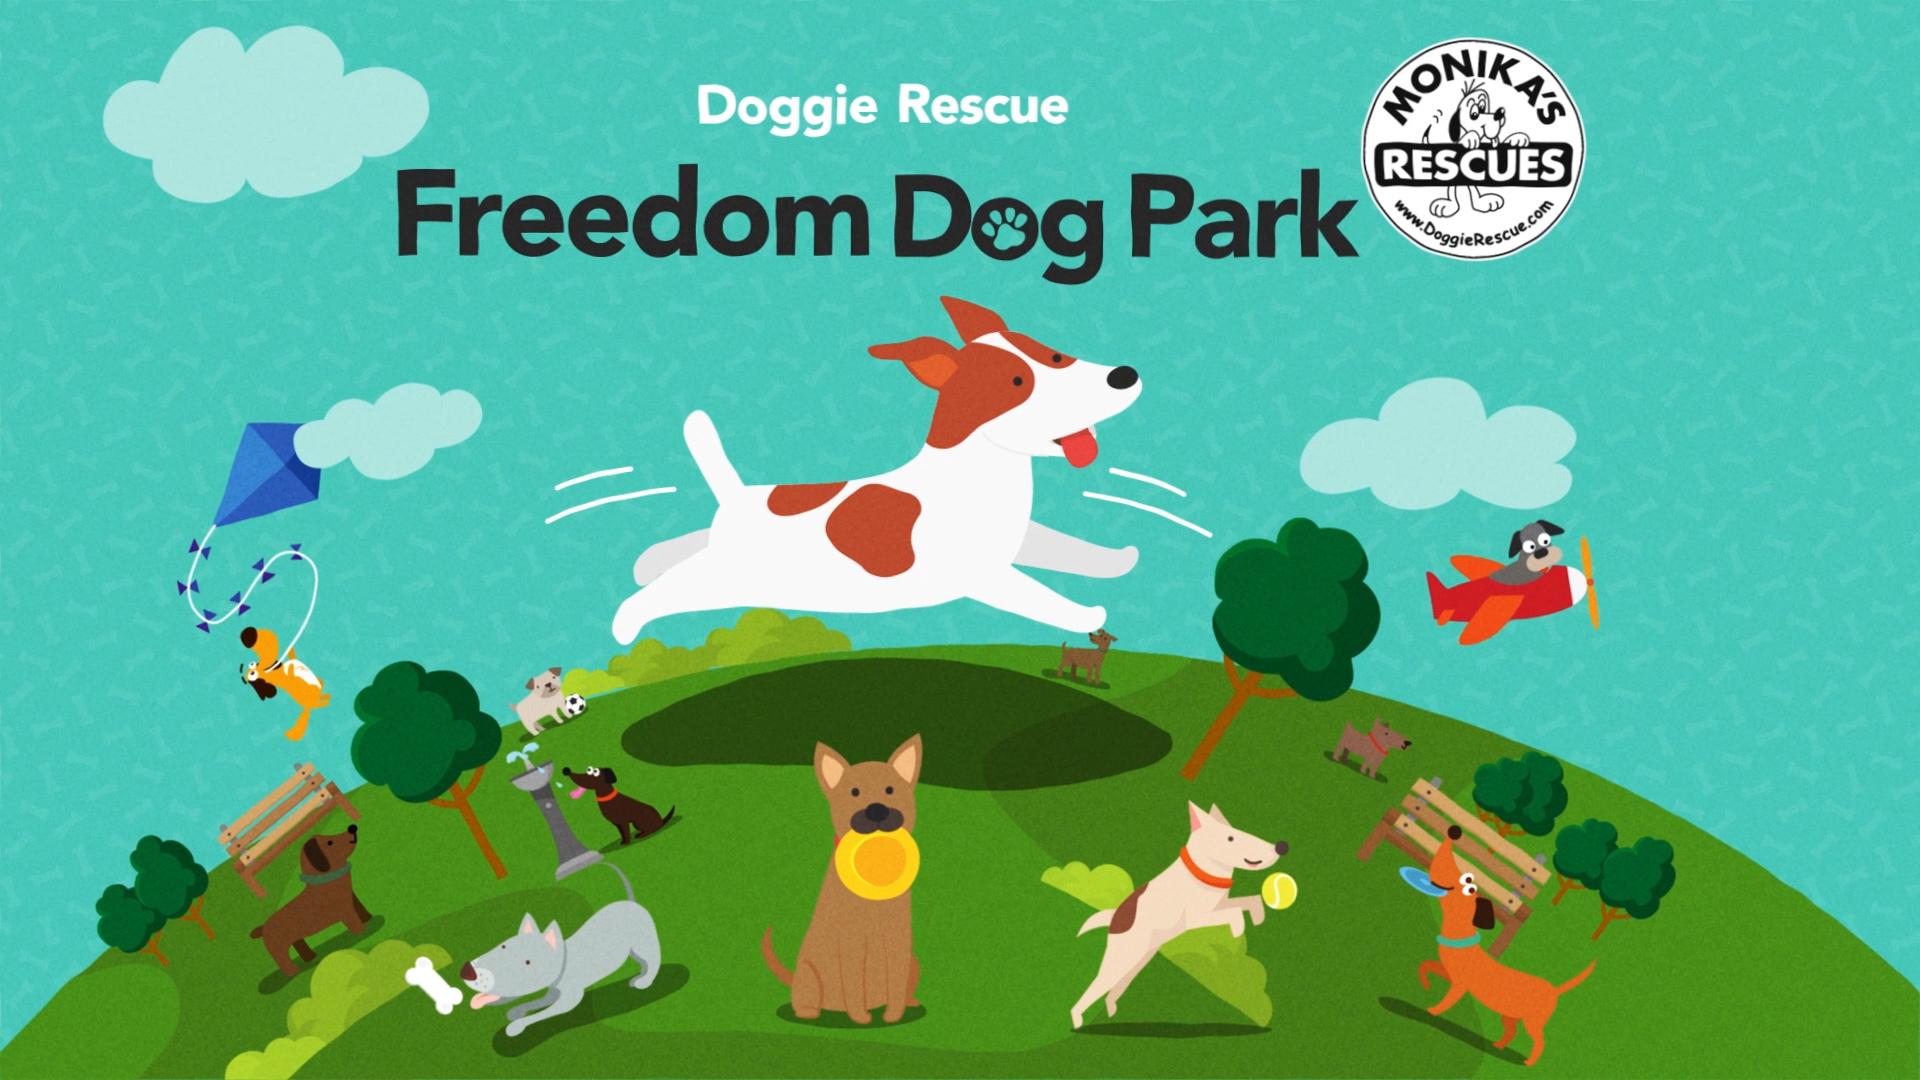 Monika's Doggie Rescue.00_00_30_15.Still004.jpg